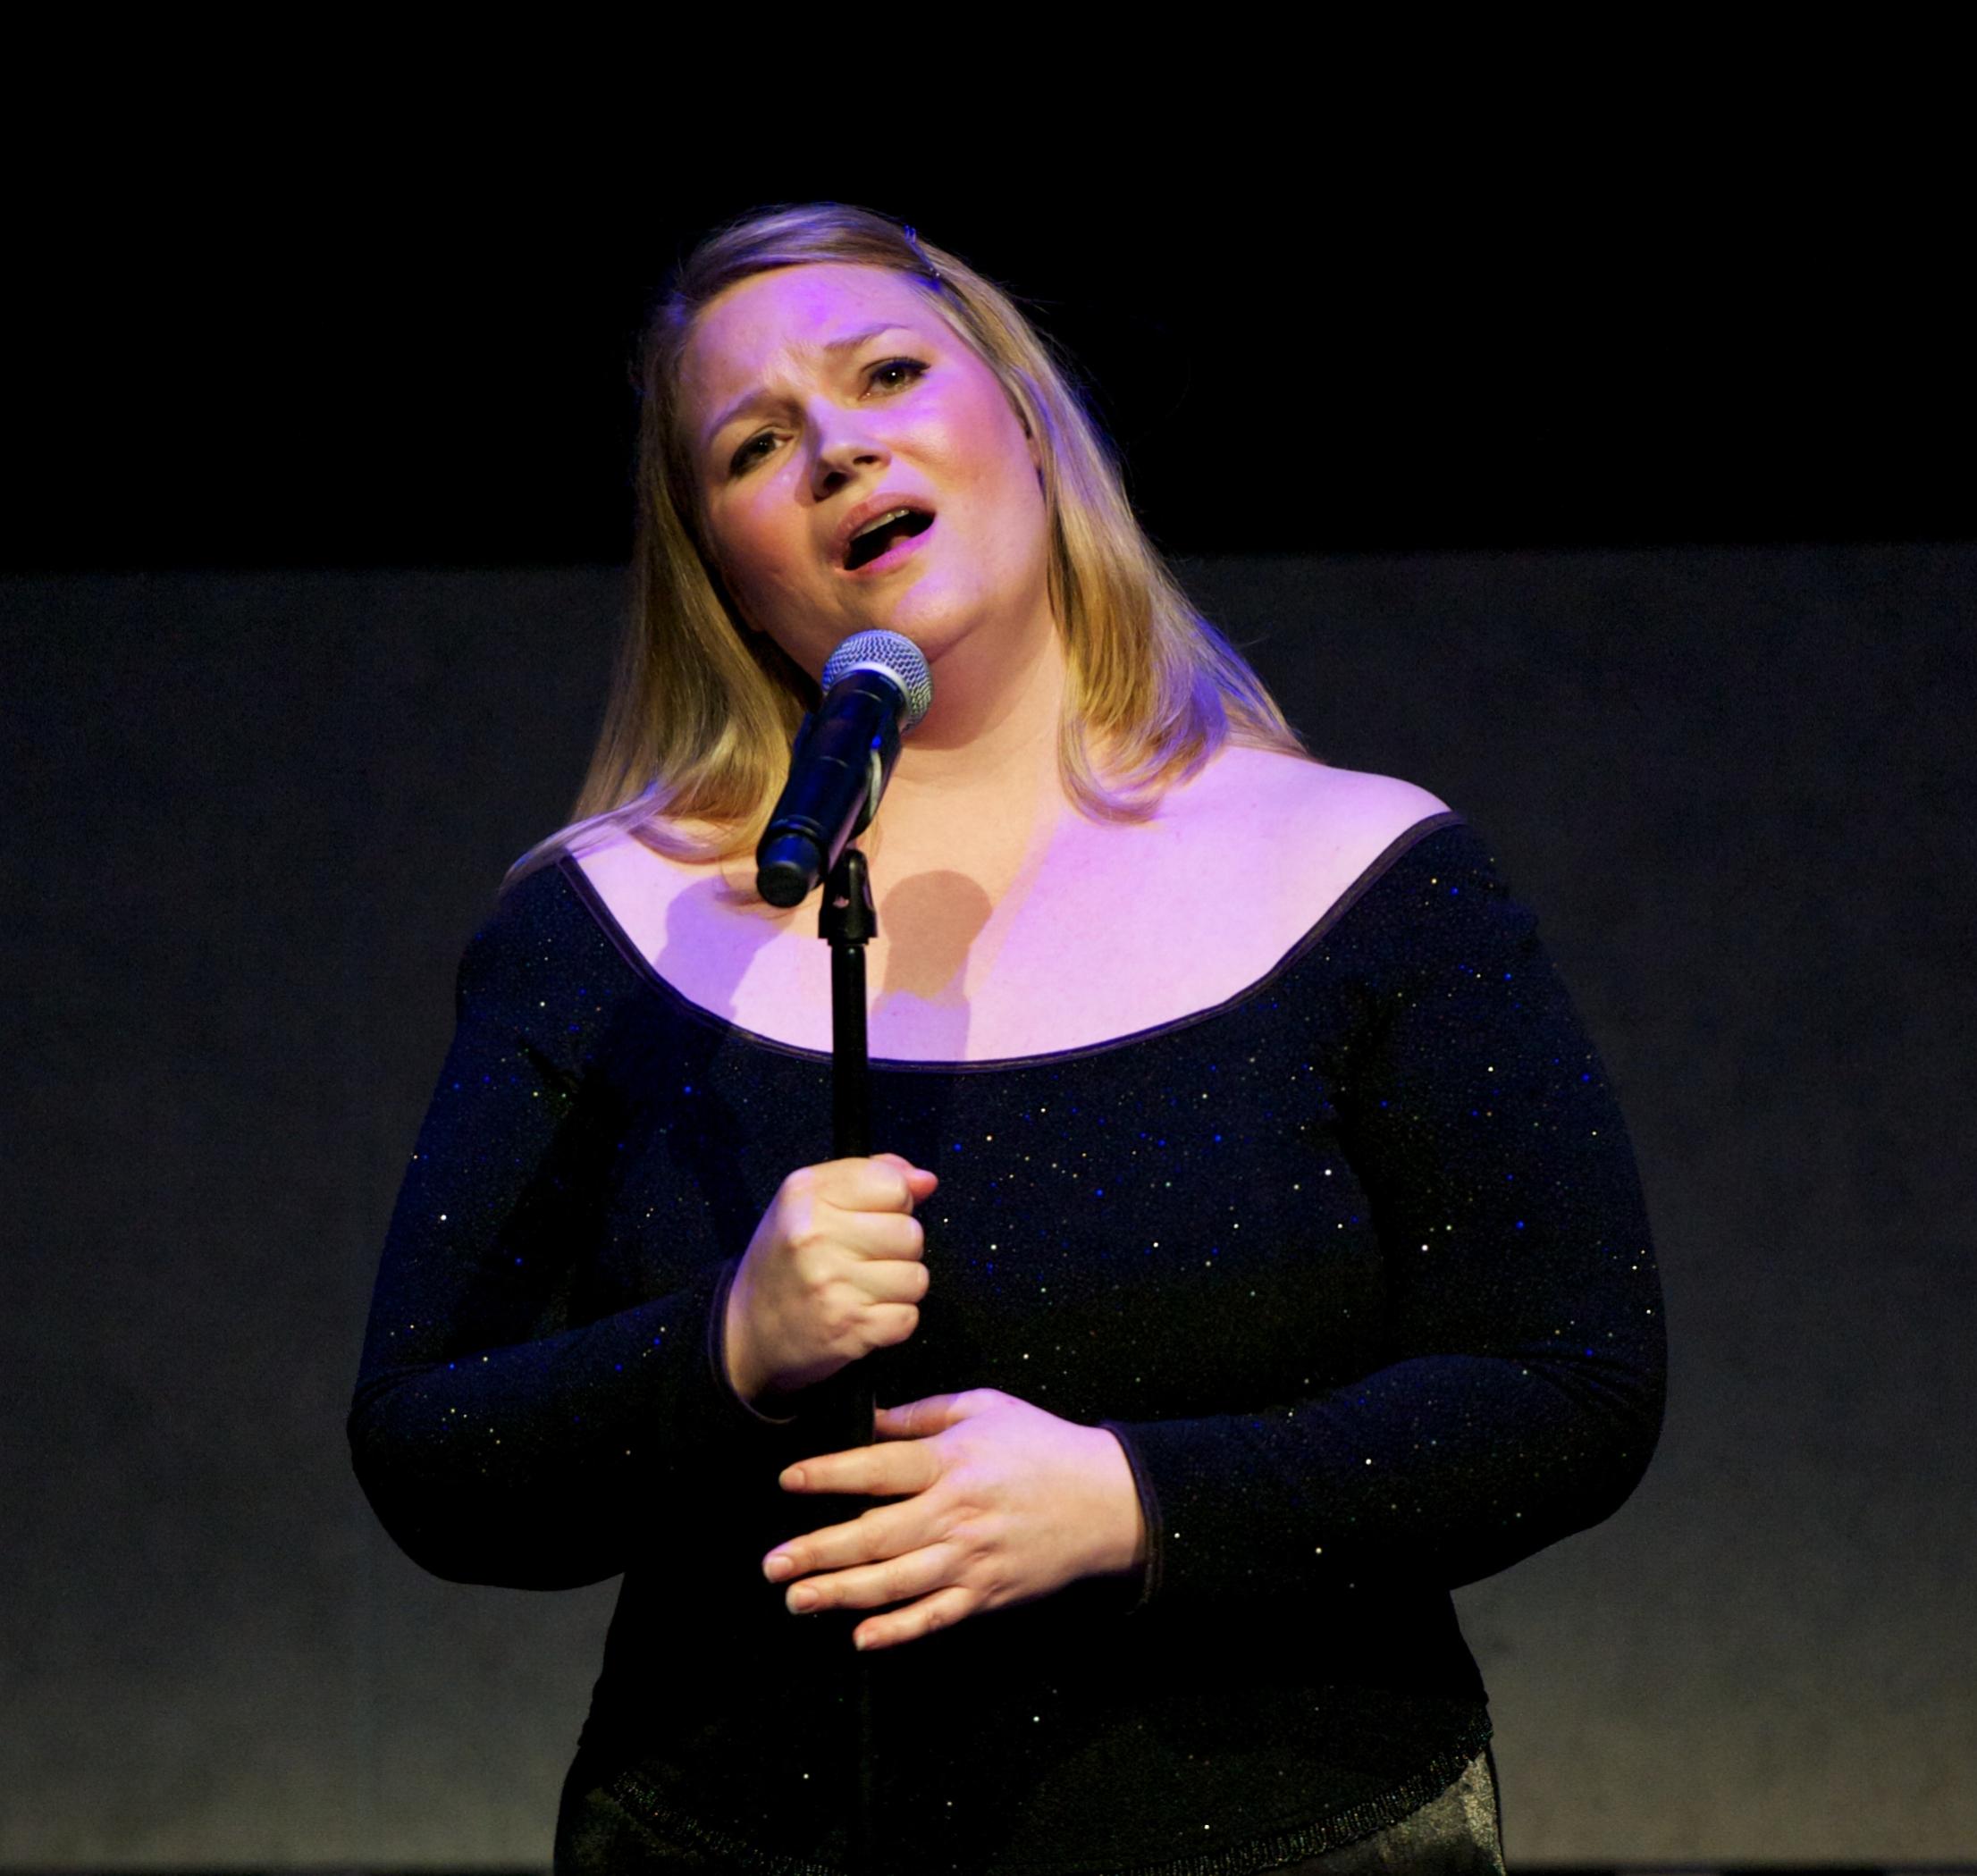 Angela Christine Smith